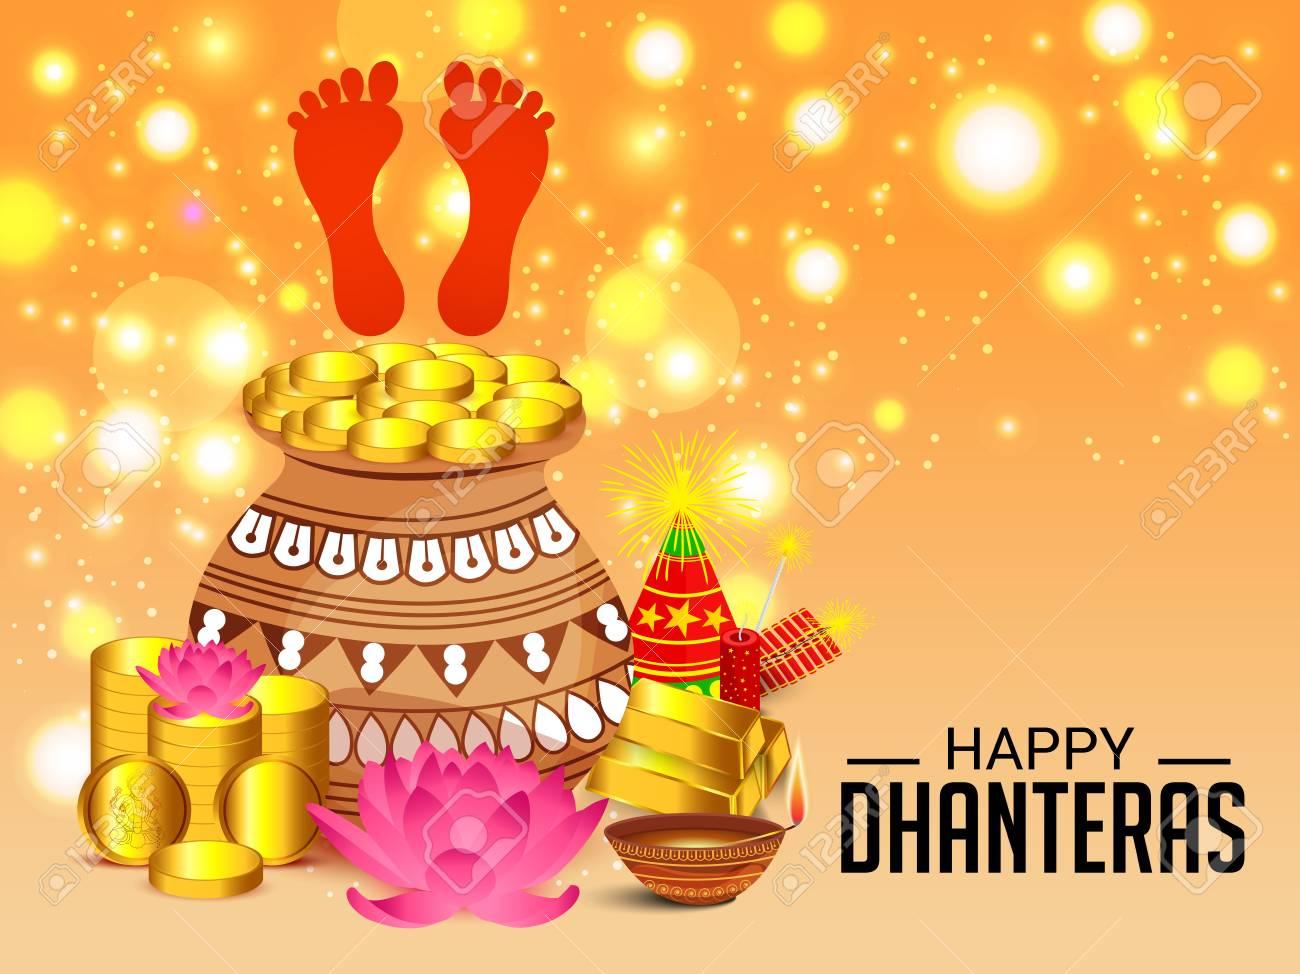 Latest Happy Dhanteras 2019 Hd Pics